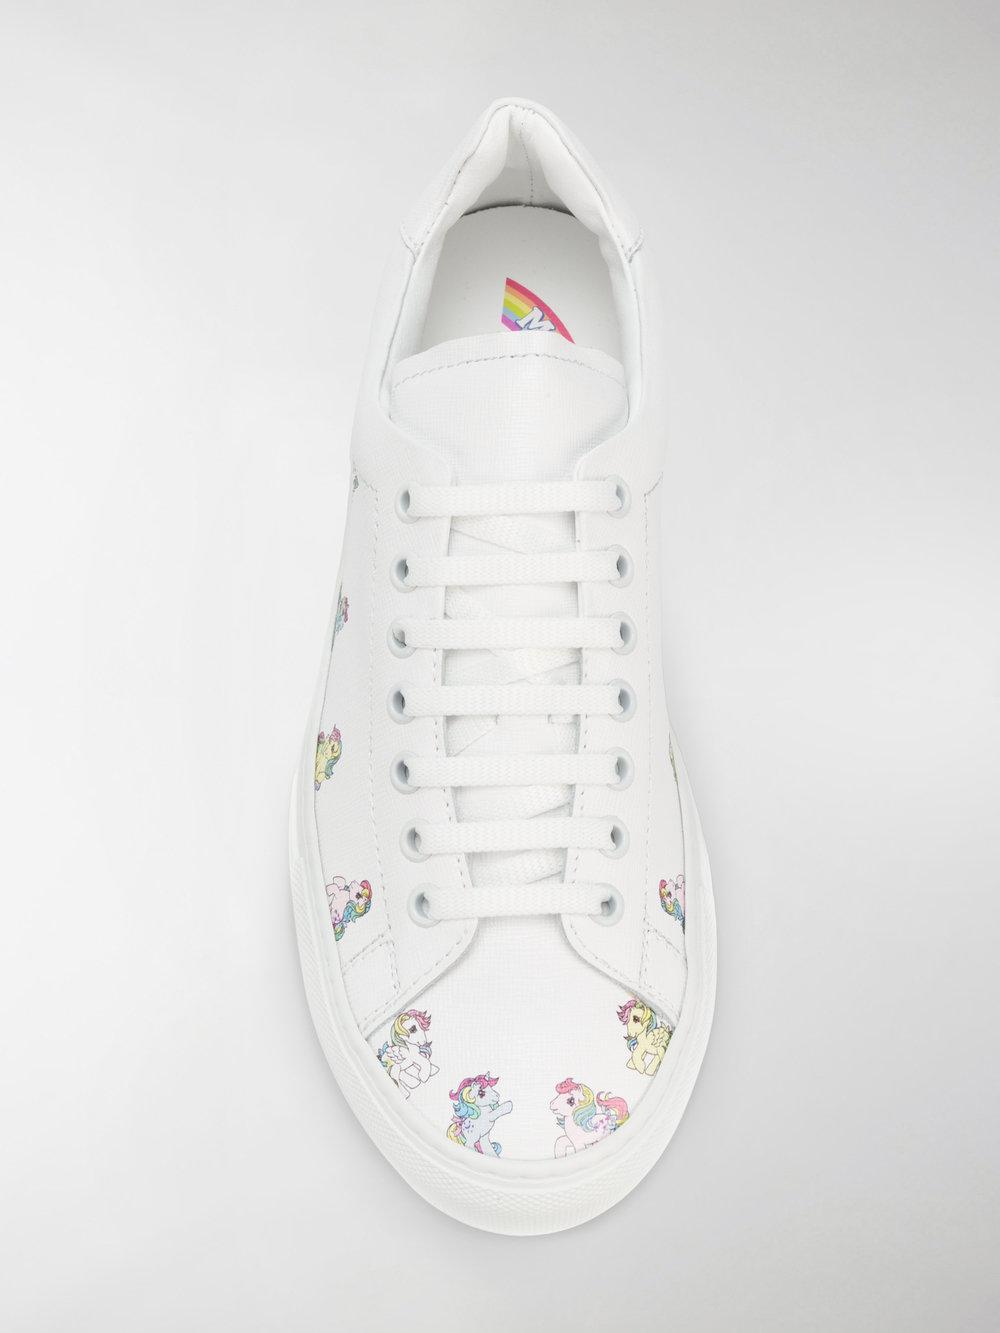 Joshua Sanders My Little Pony Leather Sneakers in White